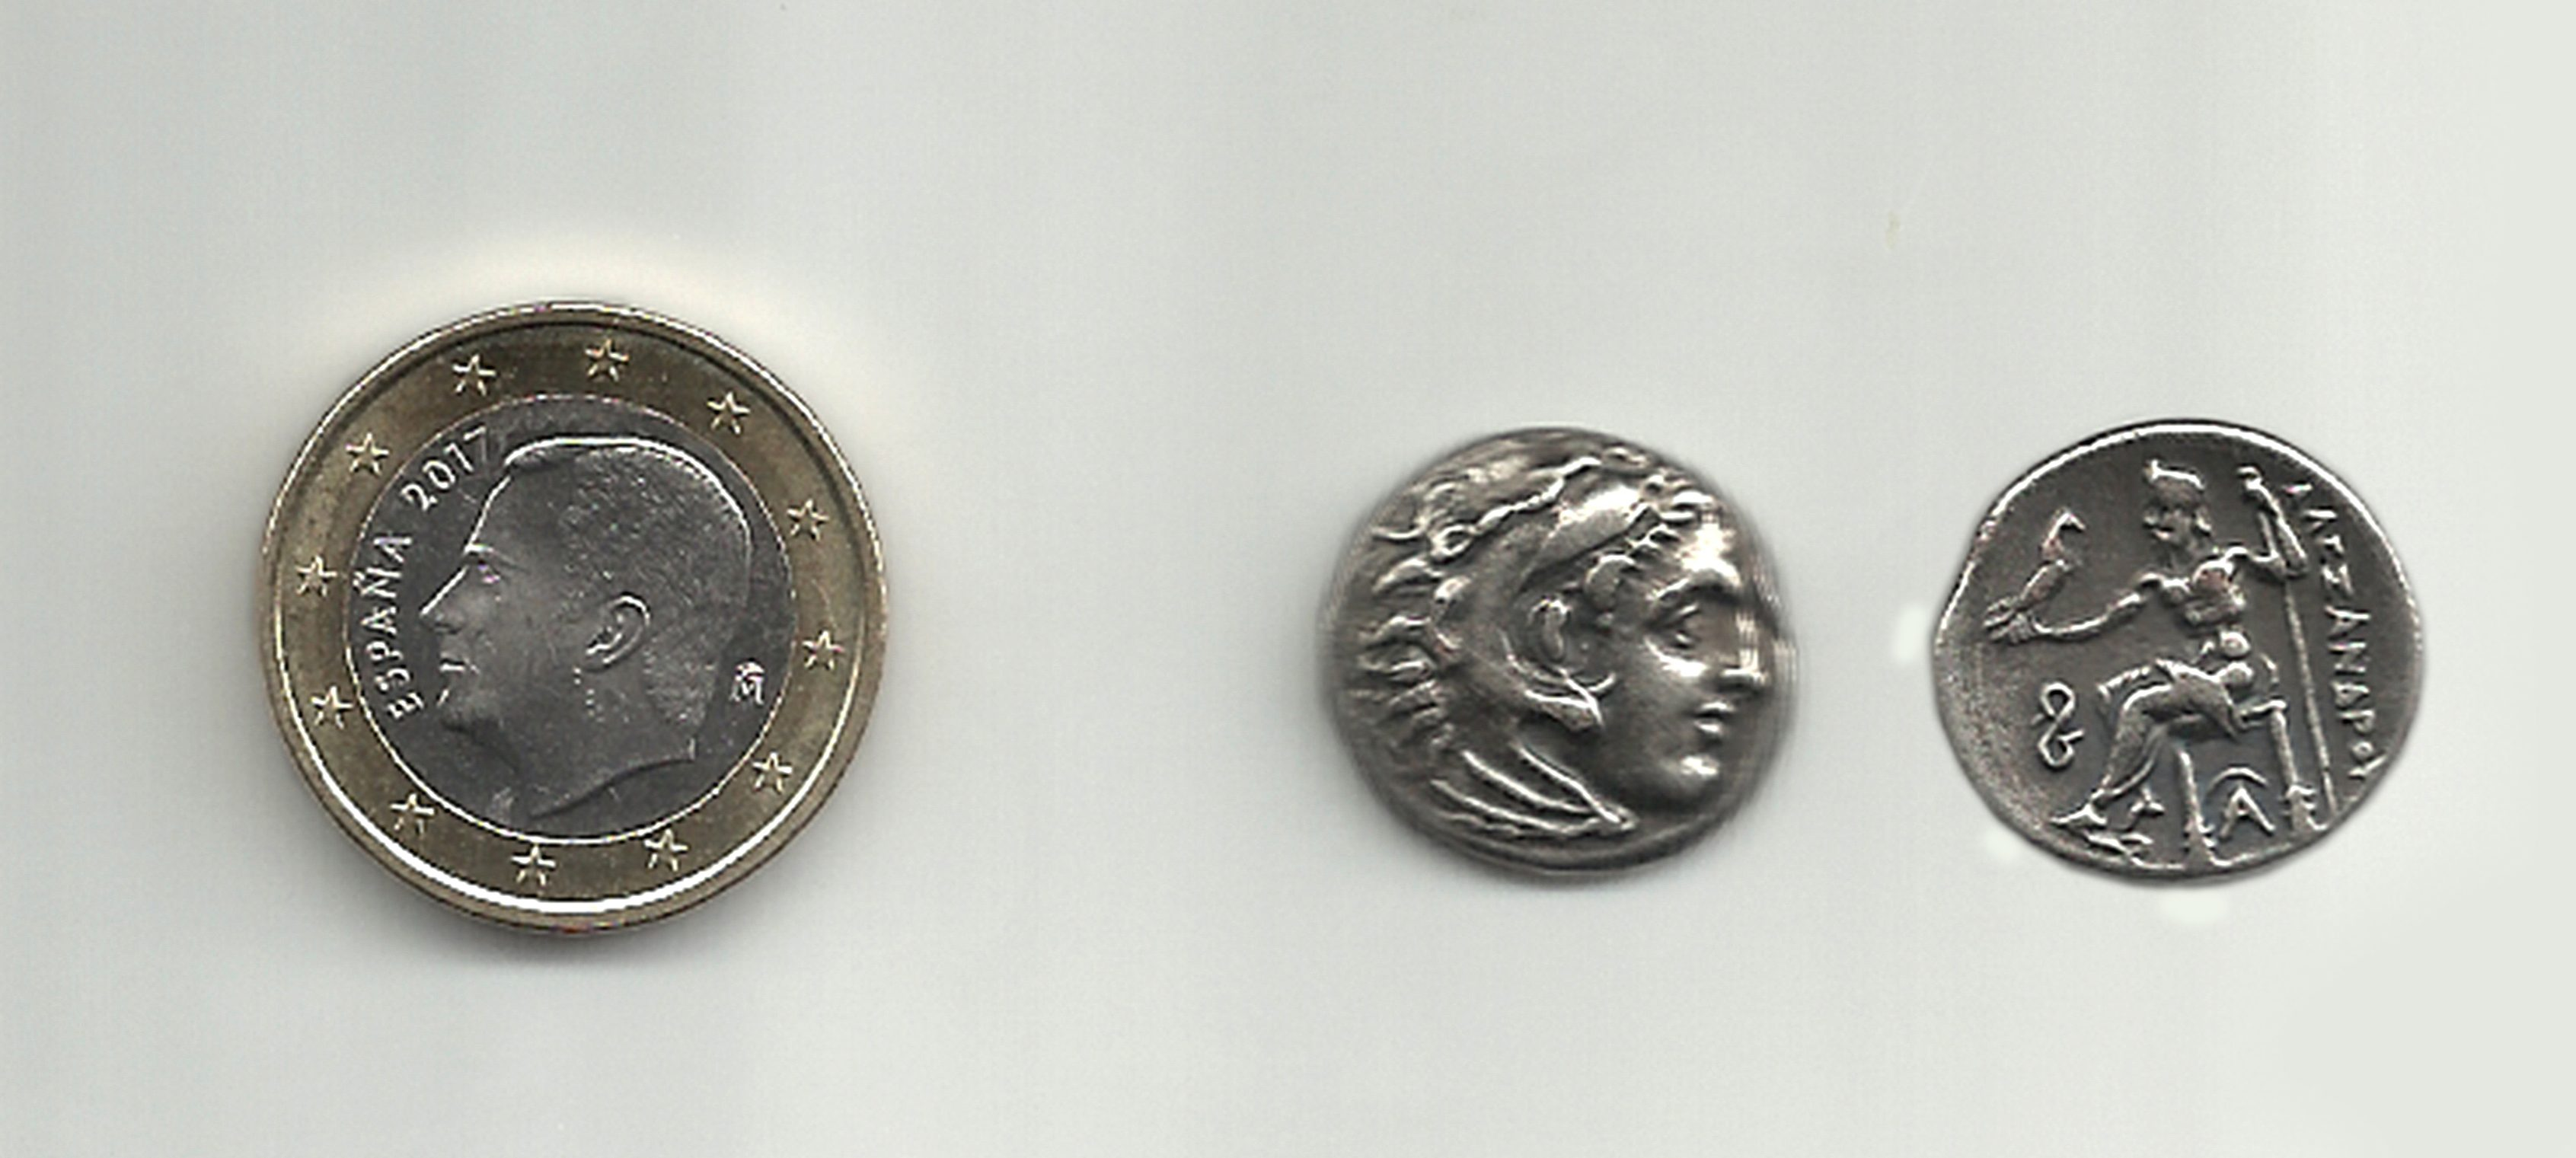 Dracma de Alejandro Magno